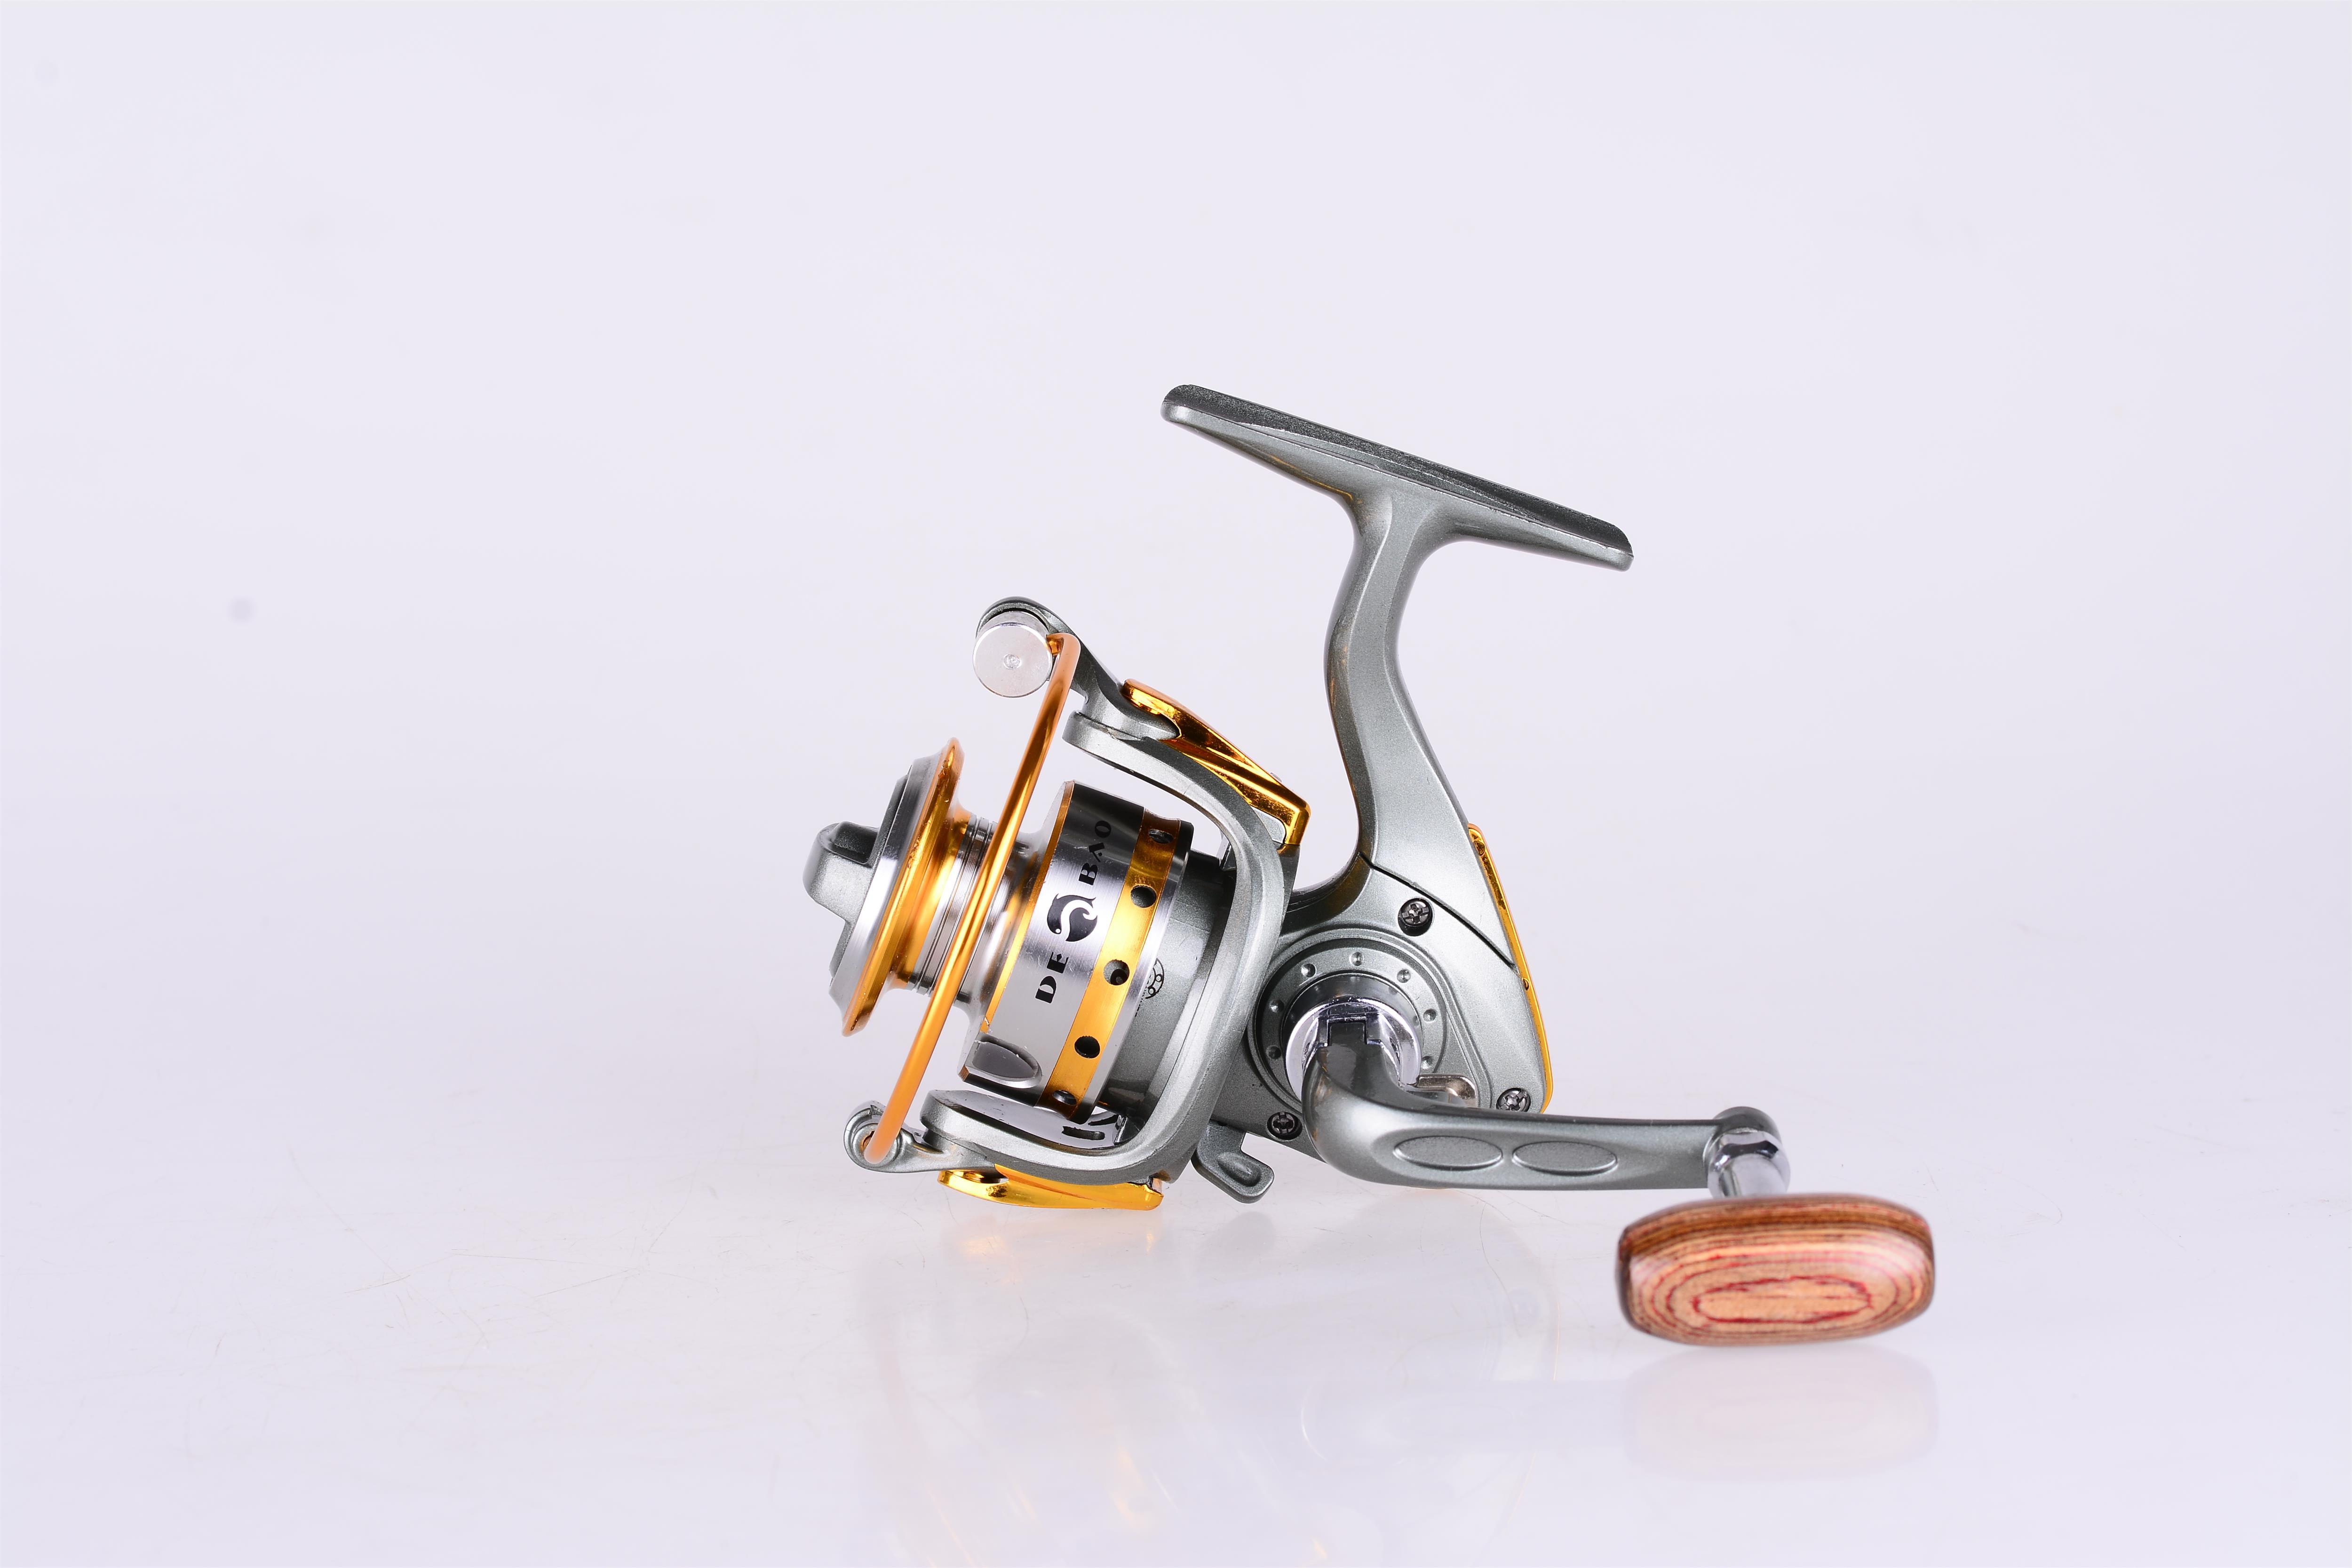 Ultra Cheap Small whosale DK150 Spinnning Fishing Reel